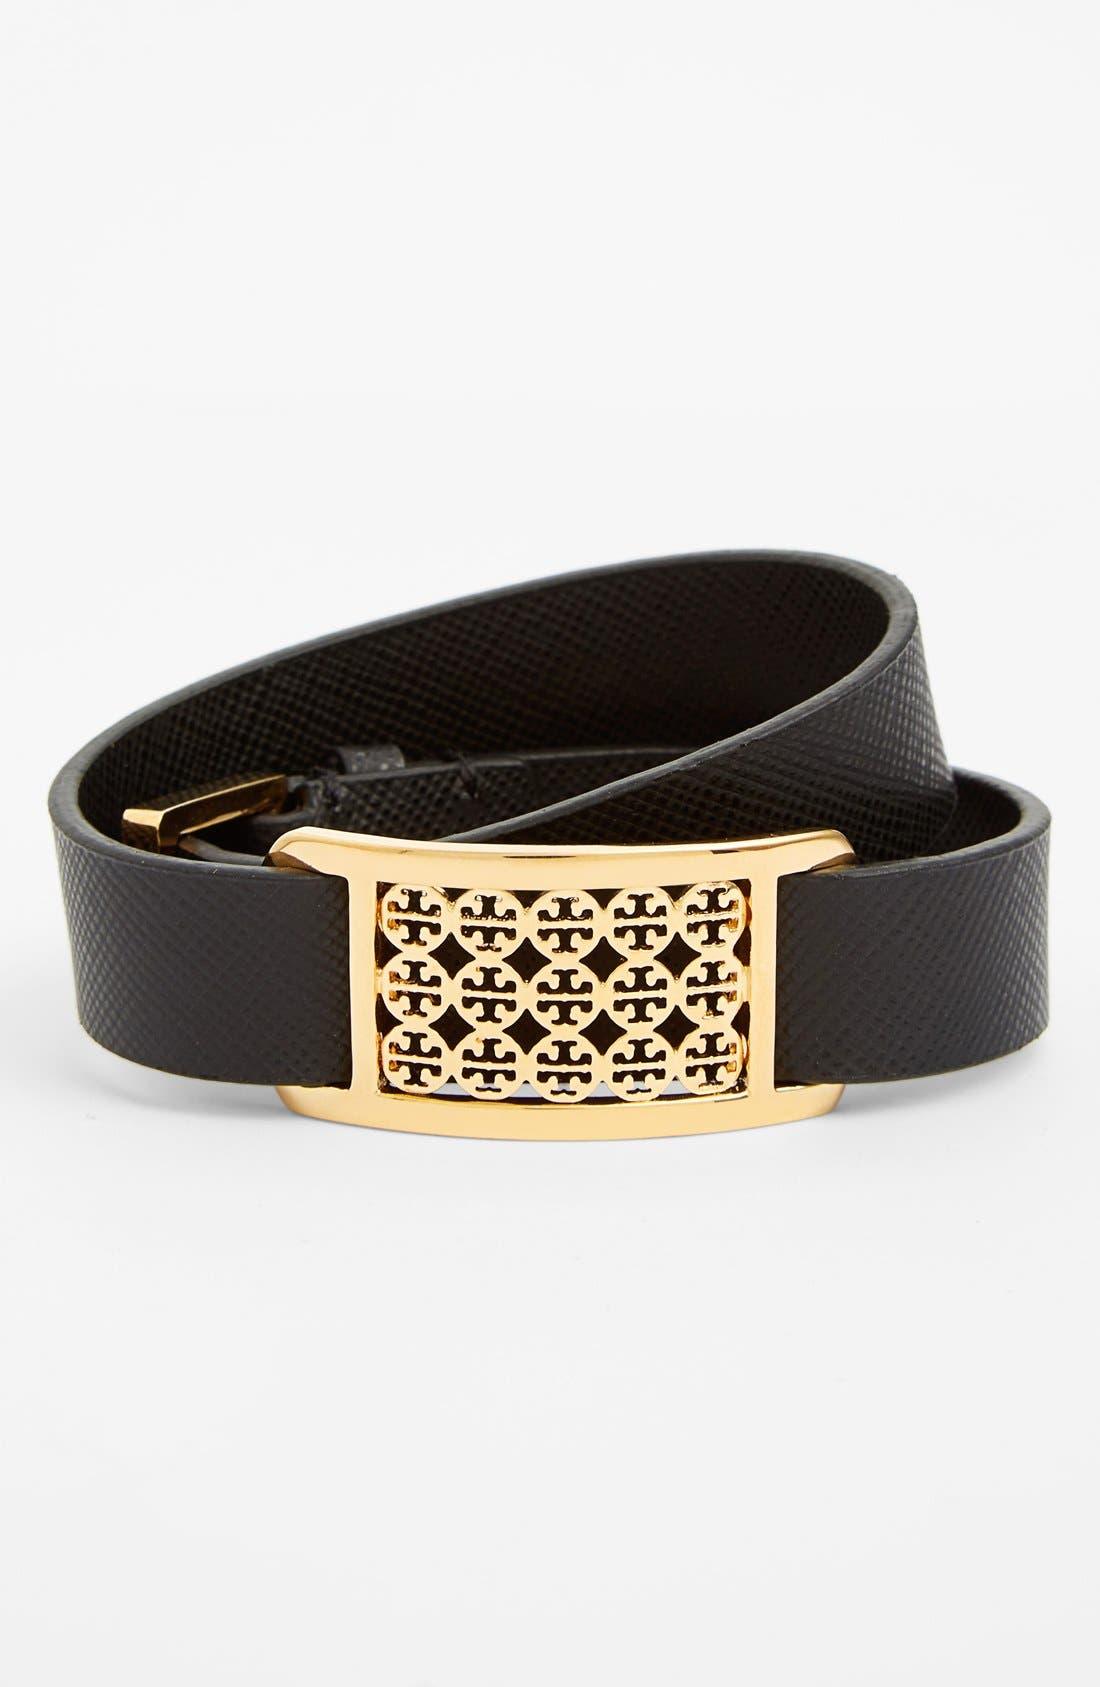 Main Image - Tory Burch 'Kinsley' Logo Plaque Leather Wrap Bracelet